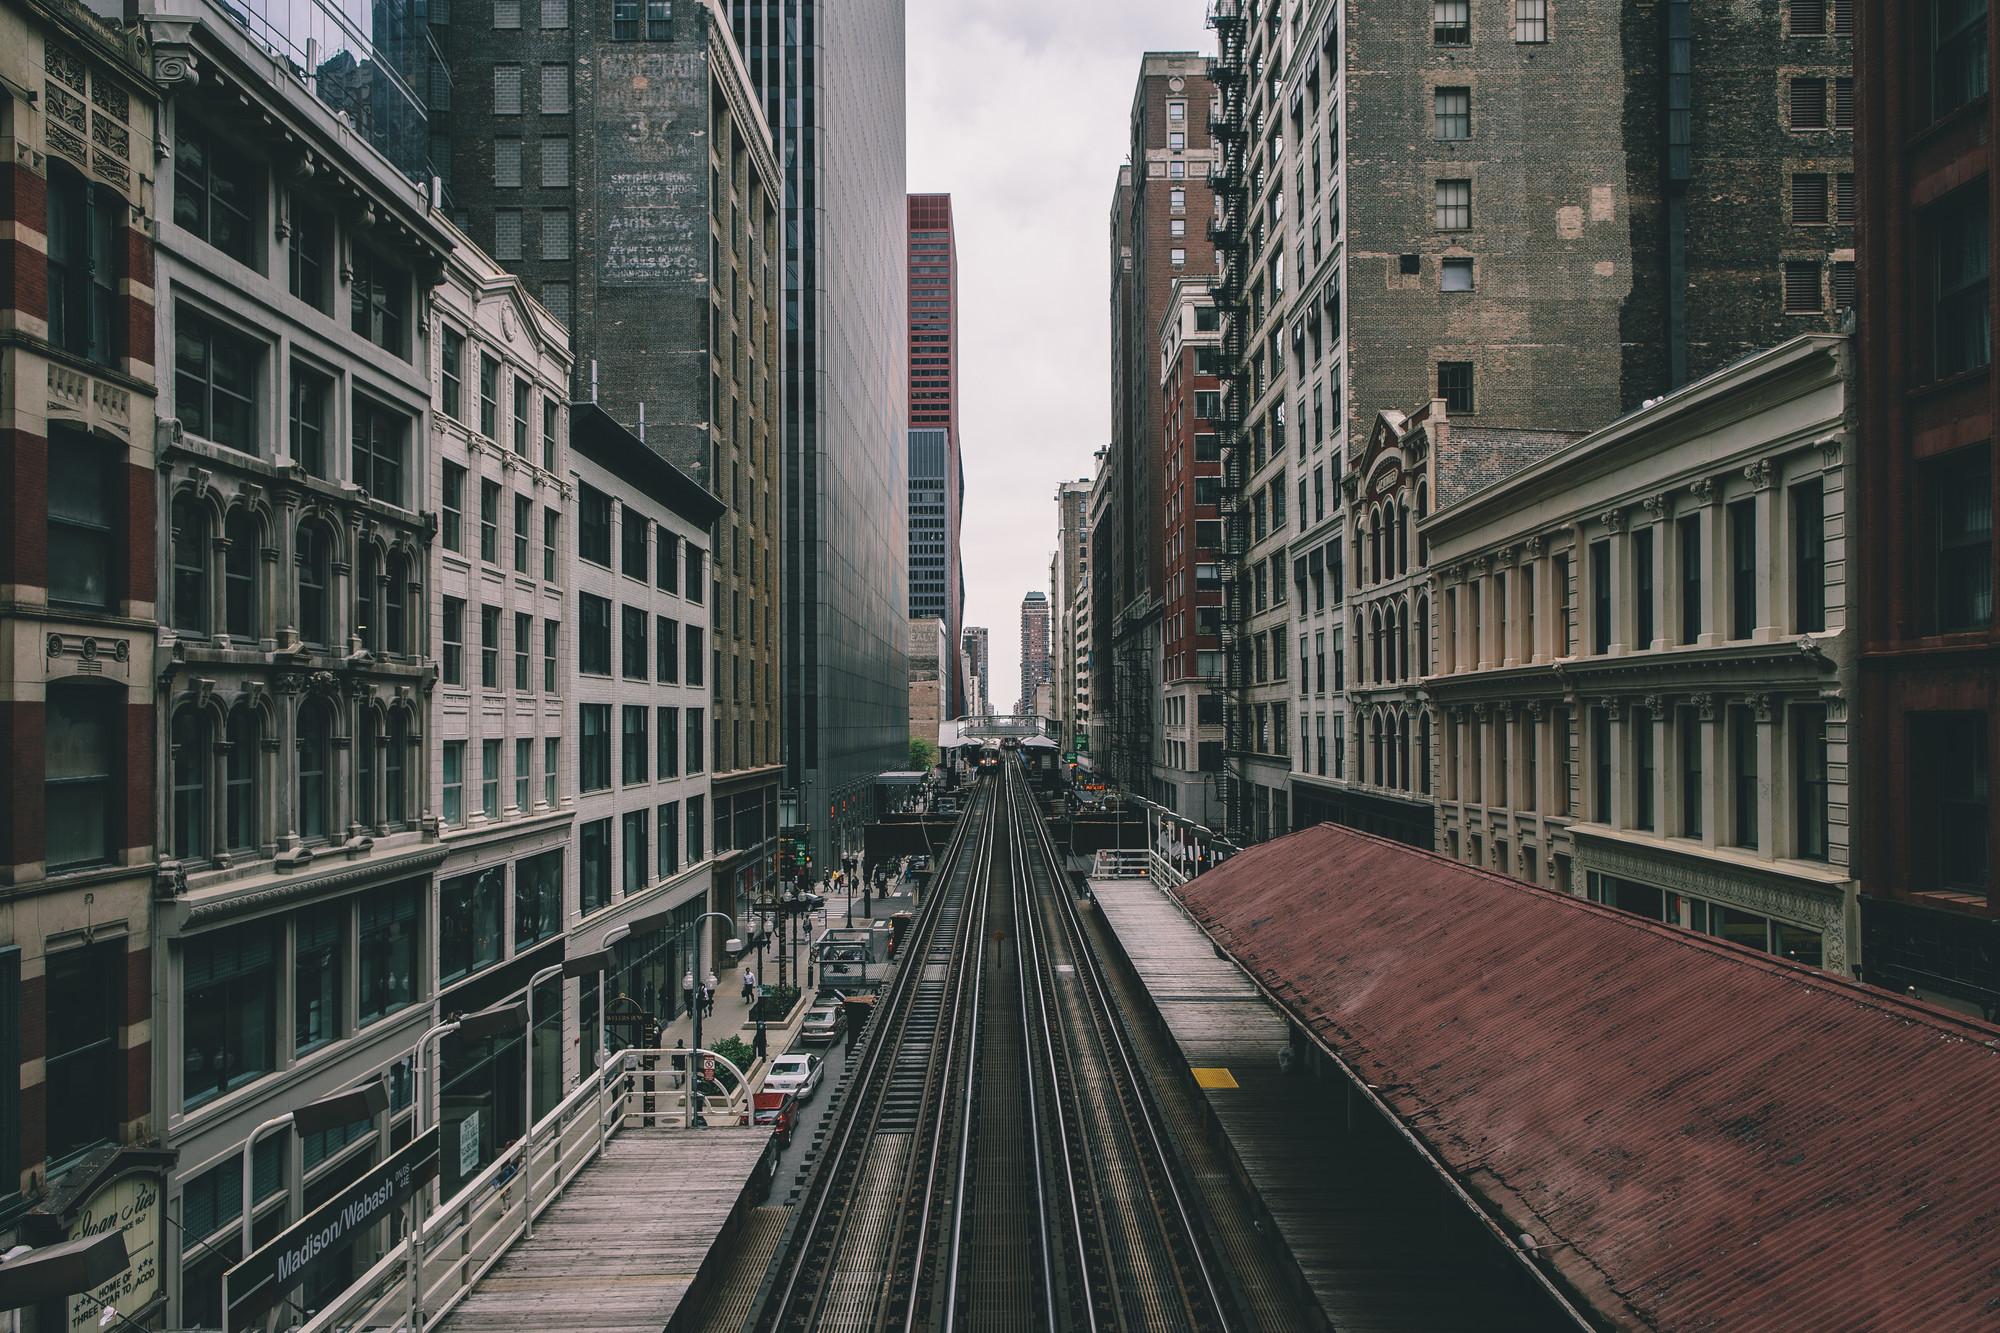 Online Class / Cityscape Photography: Capture Your City's